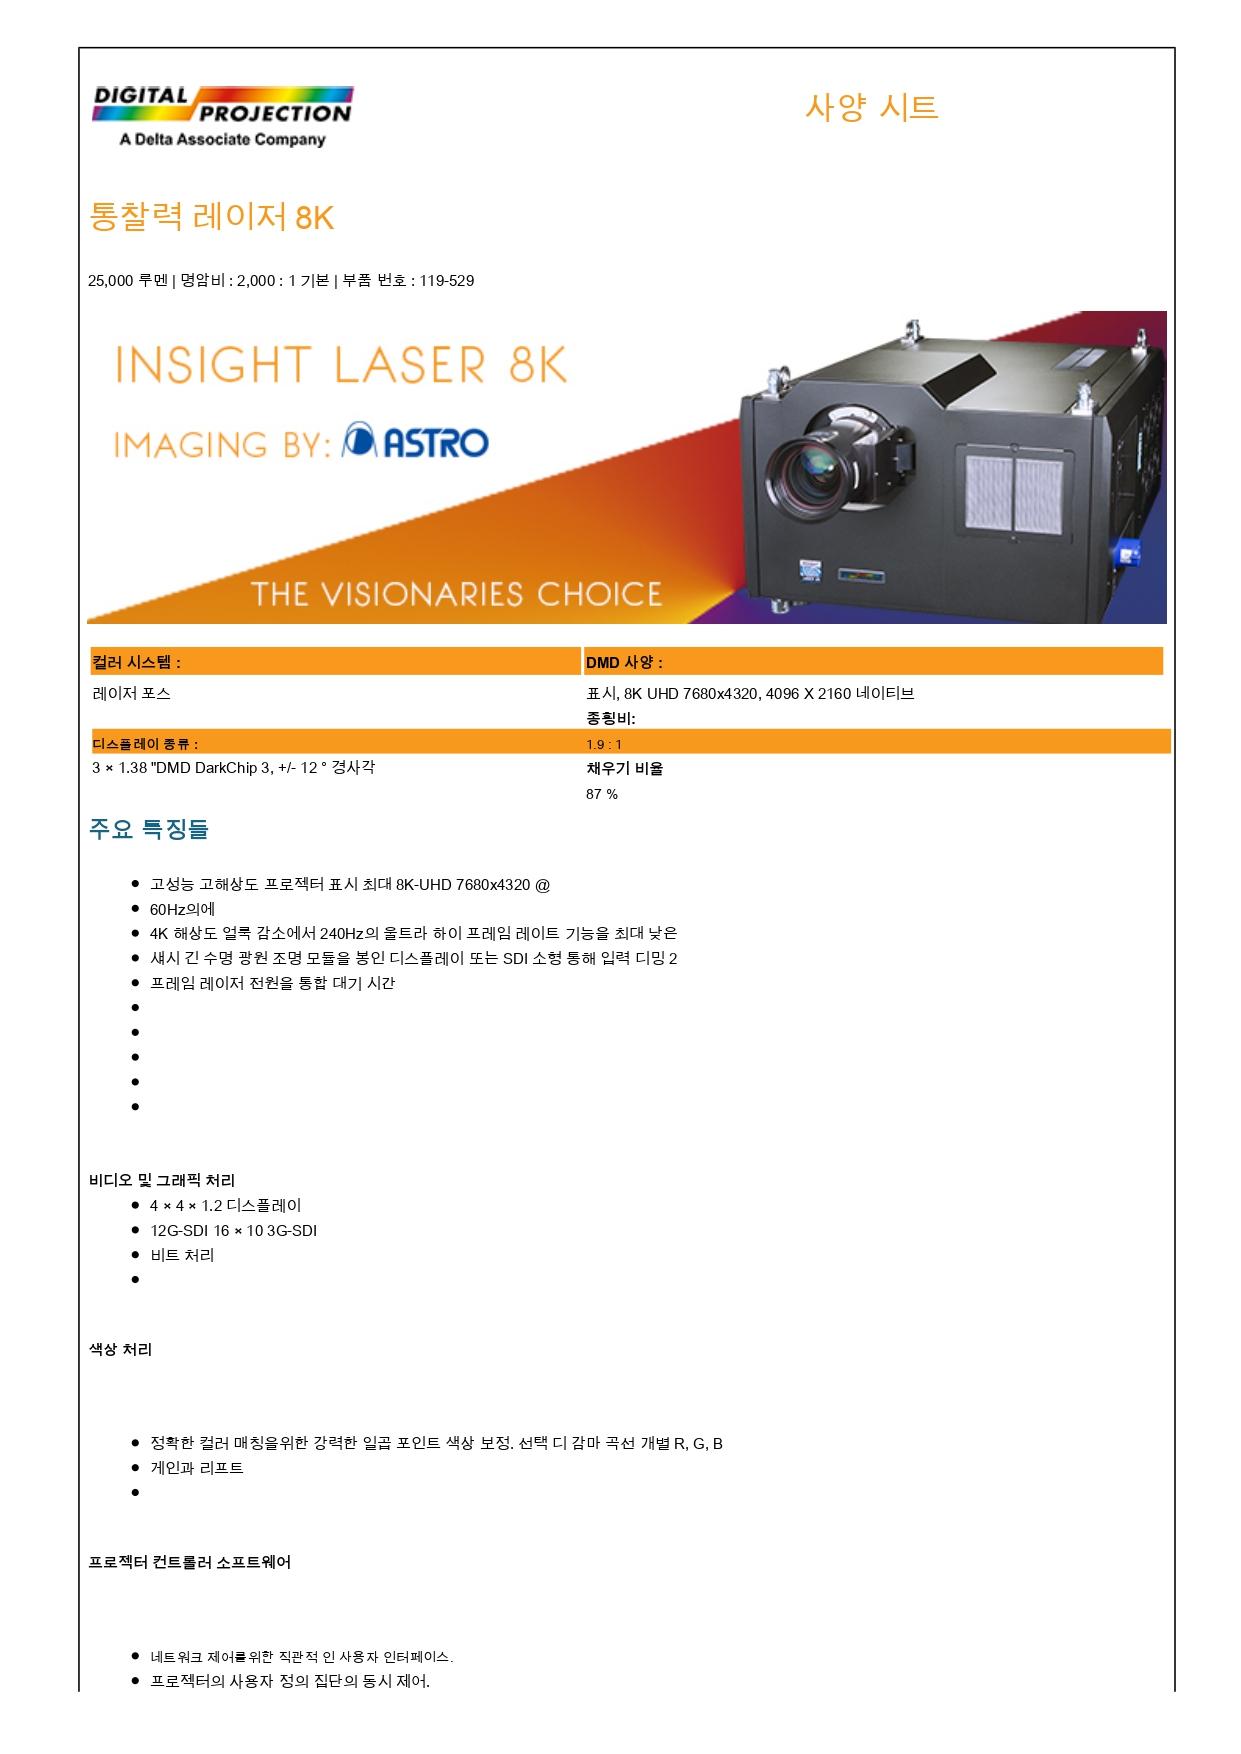 digitalprojection-119-529.en.ko_page-0001.jpg